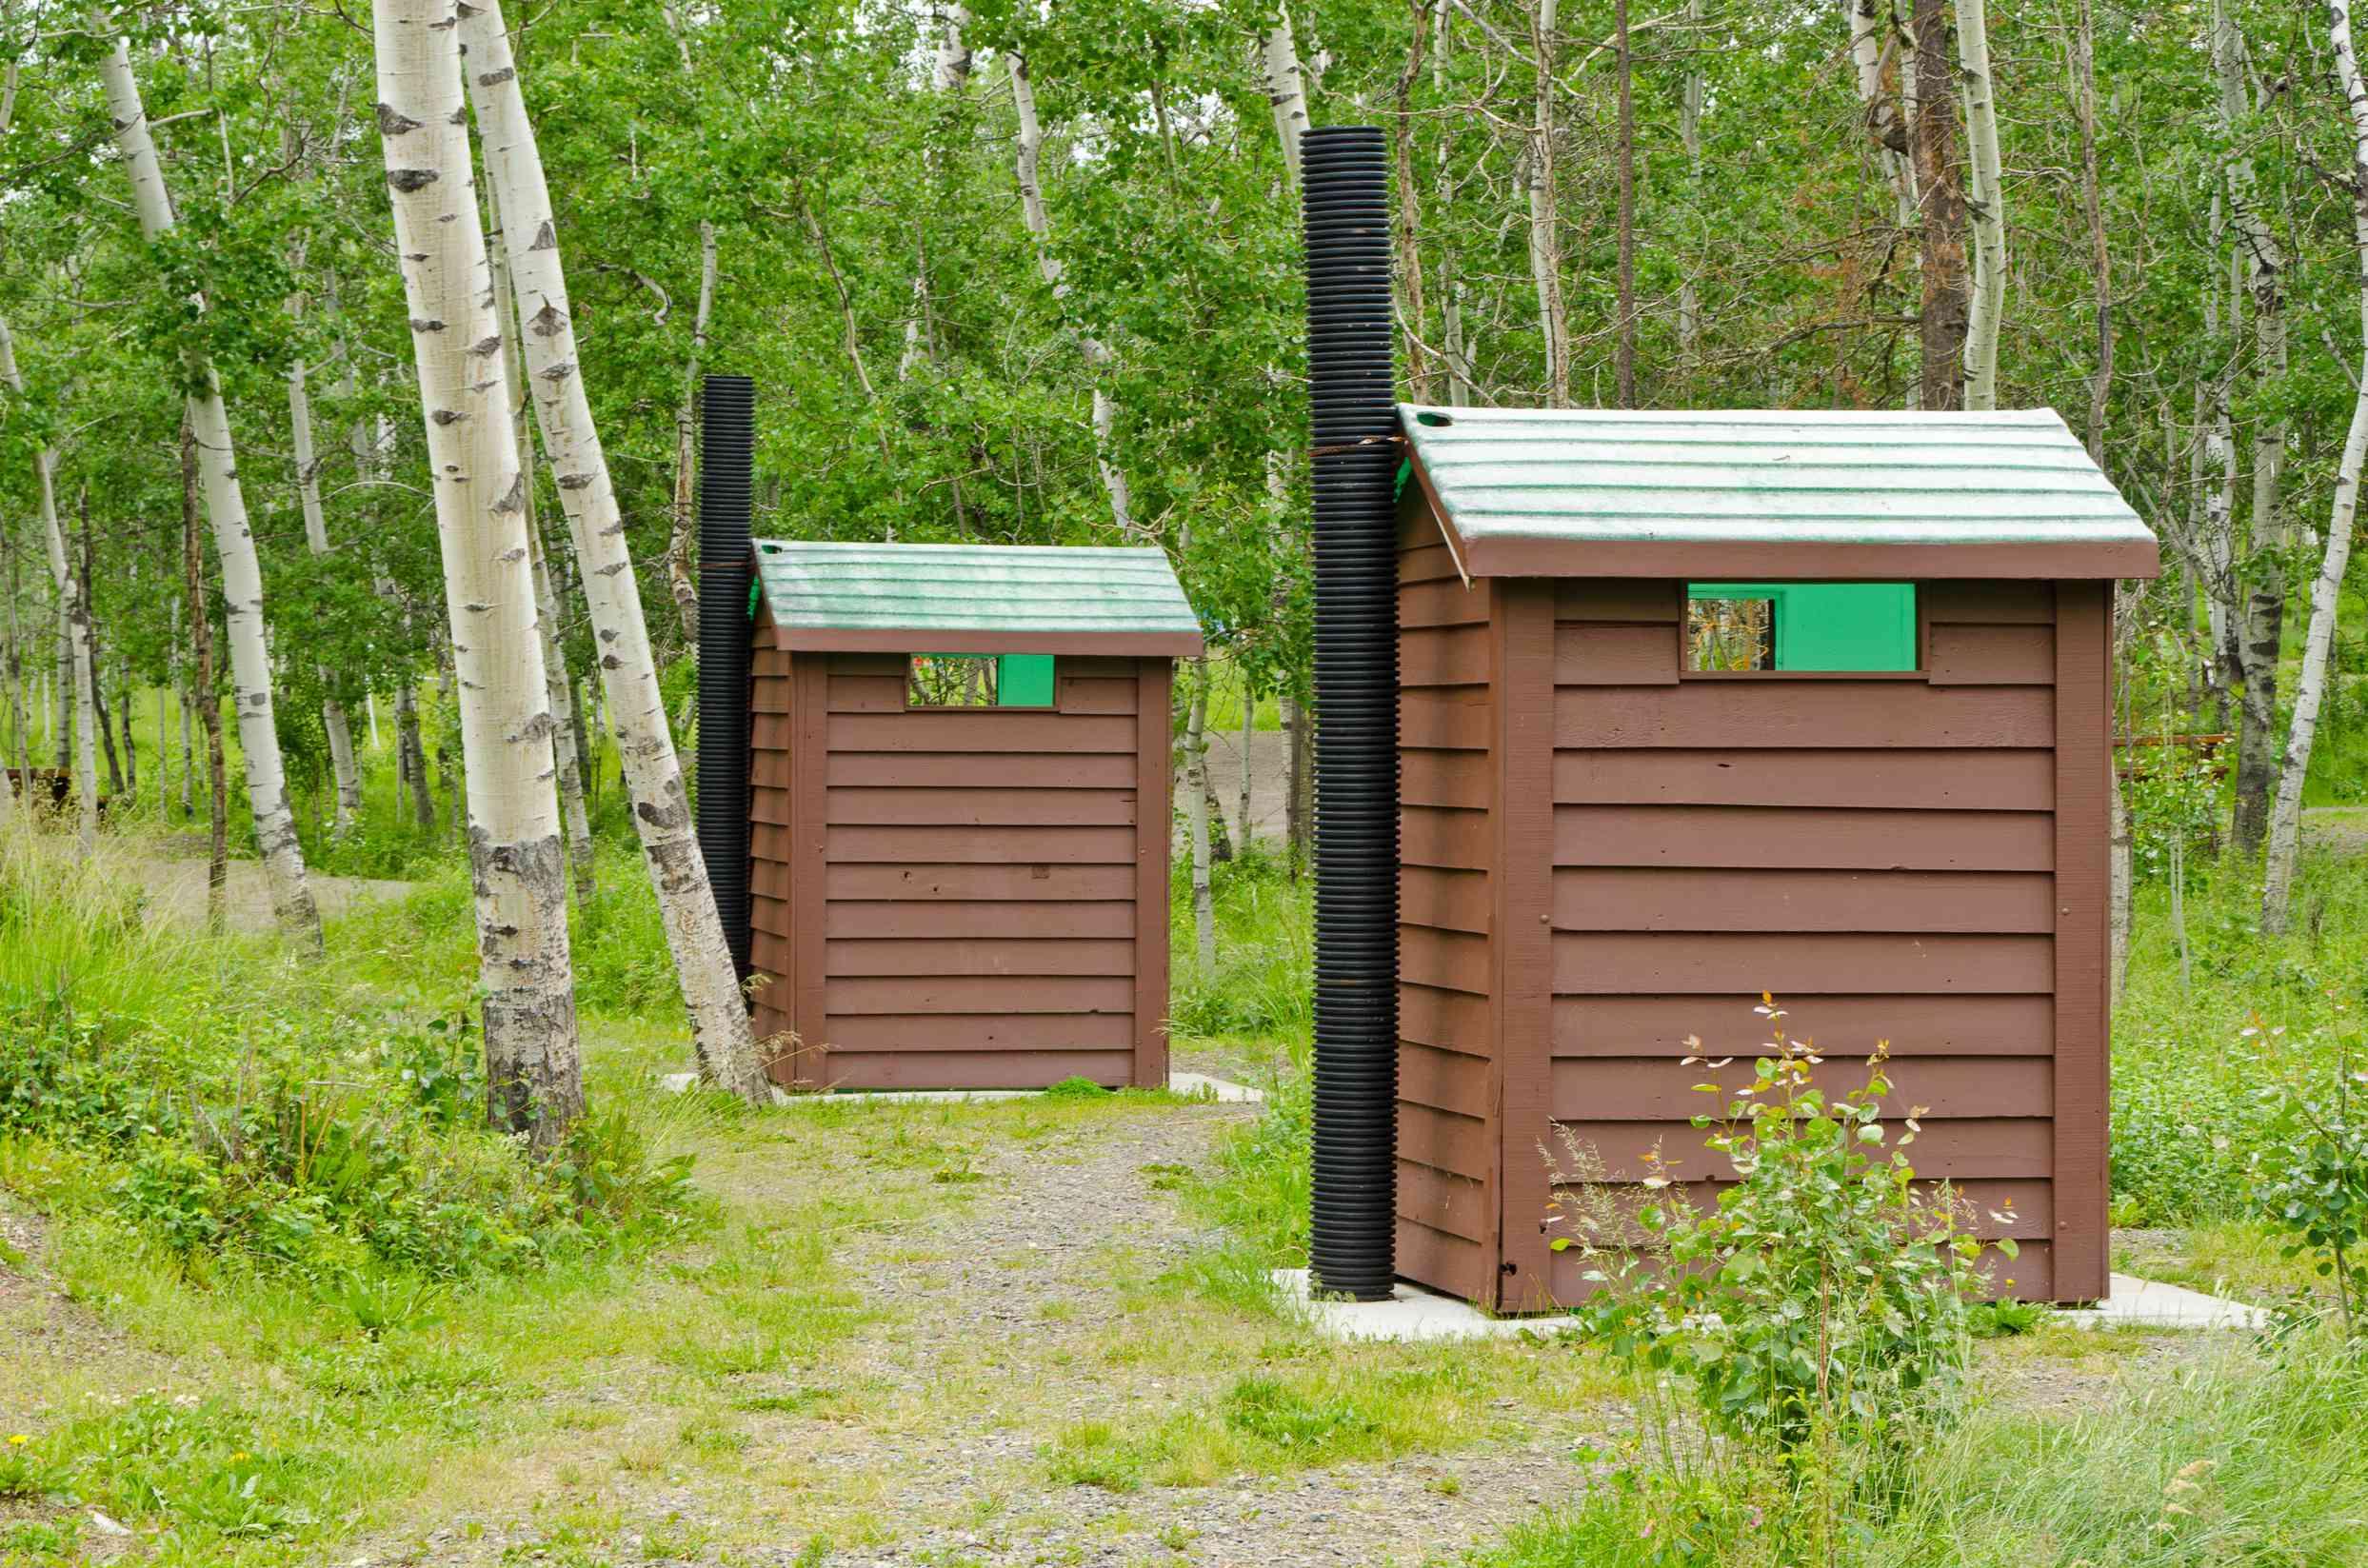 Pit toilets